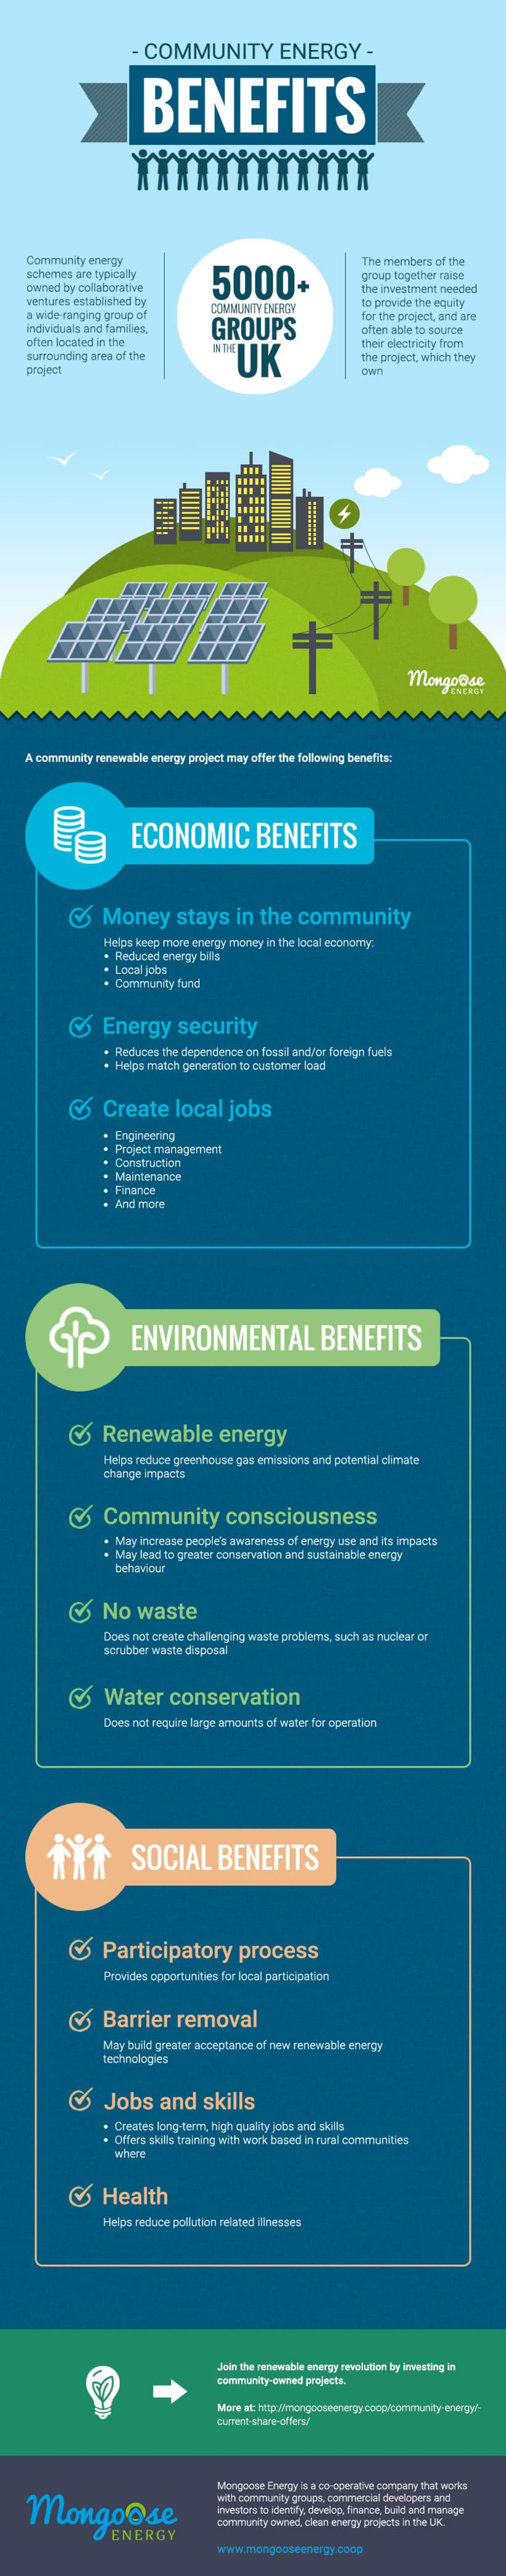 "Diseño de infografía: ""Community energy benefits"" -1"